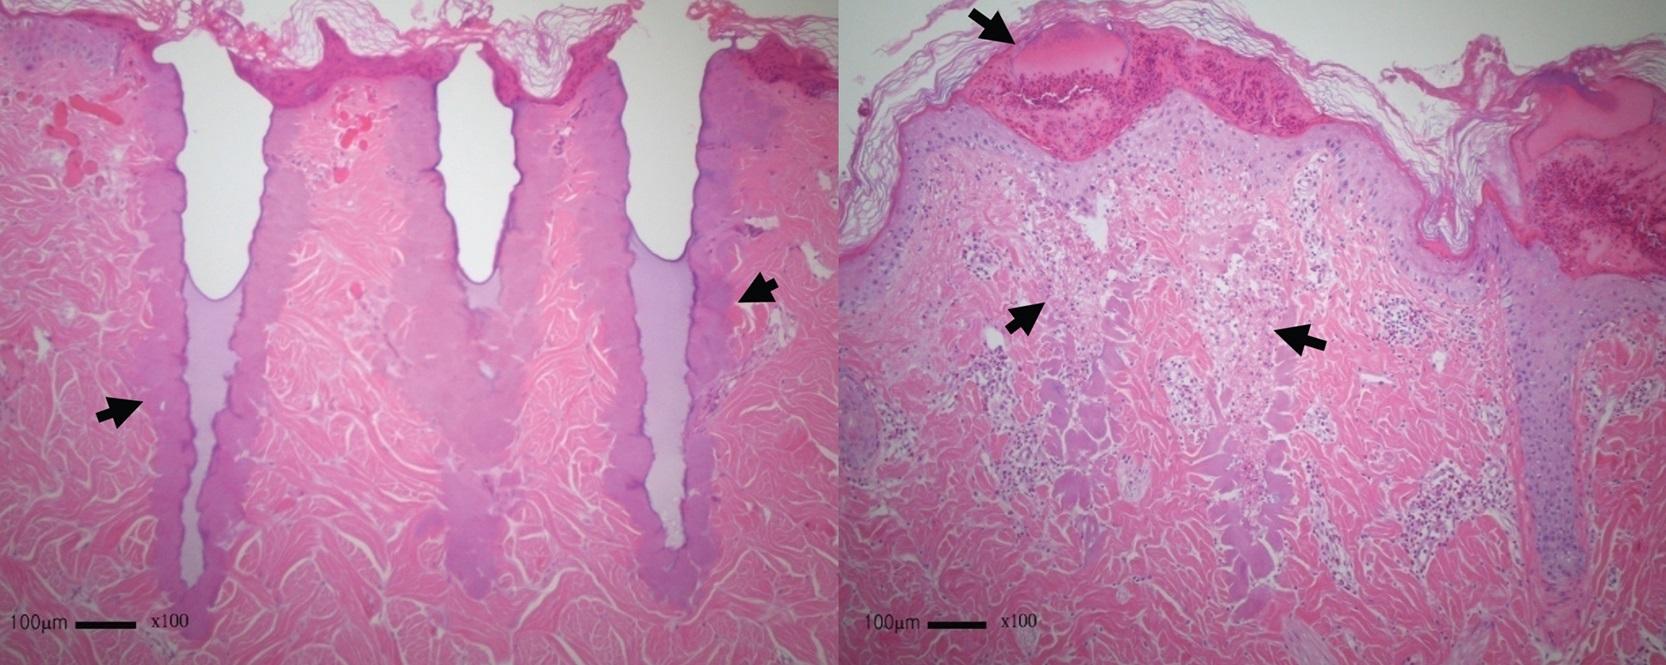 Cấu trúc da sau hai ngày trị liệu sẹo bằng eCO2.